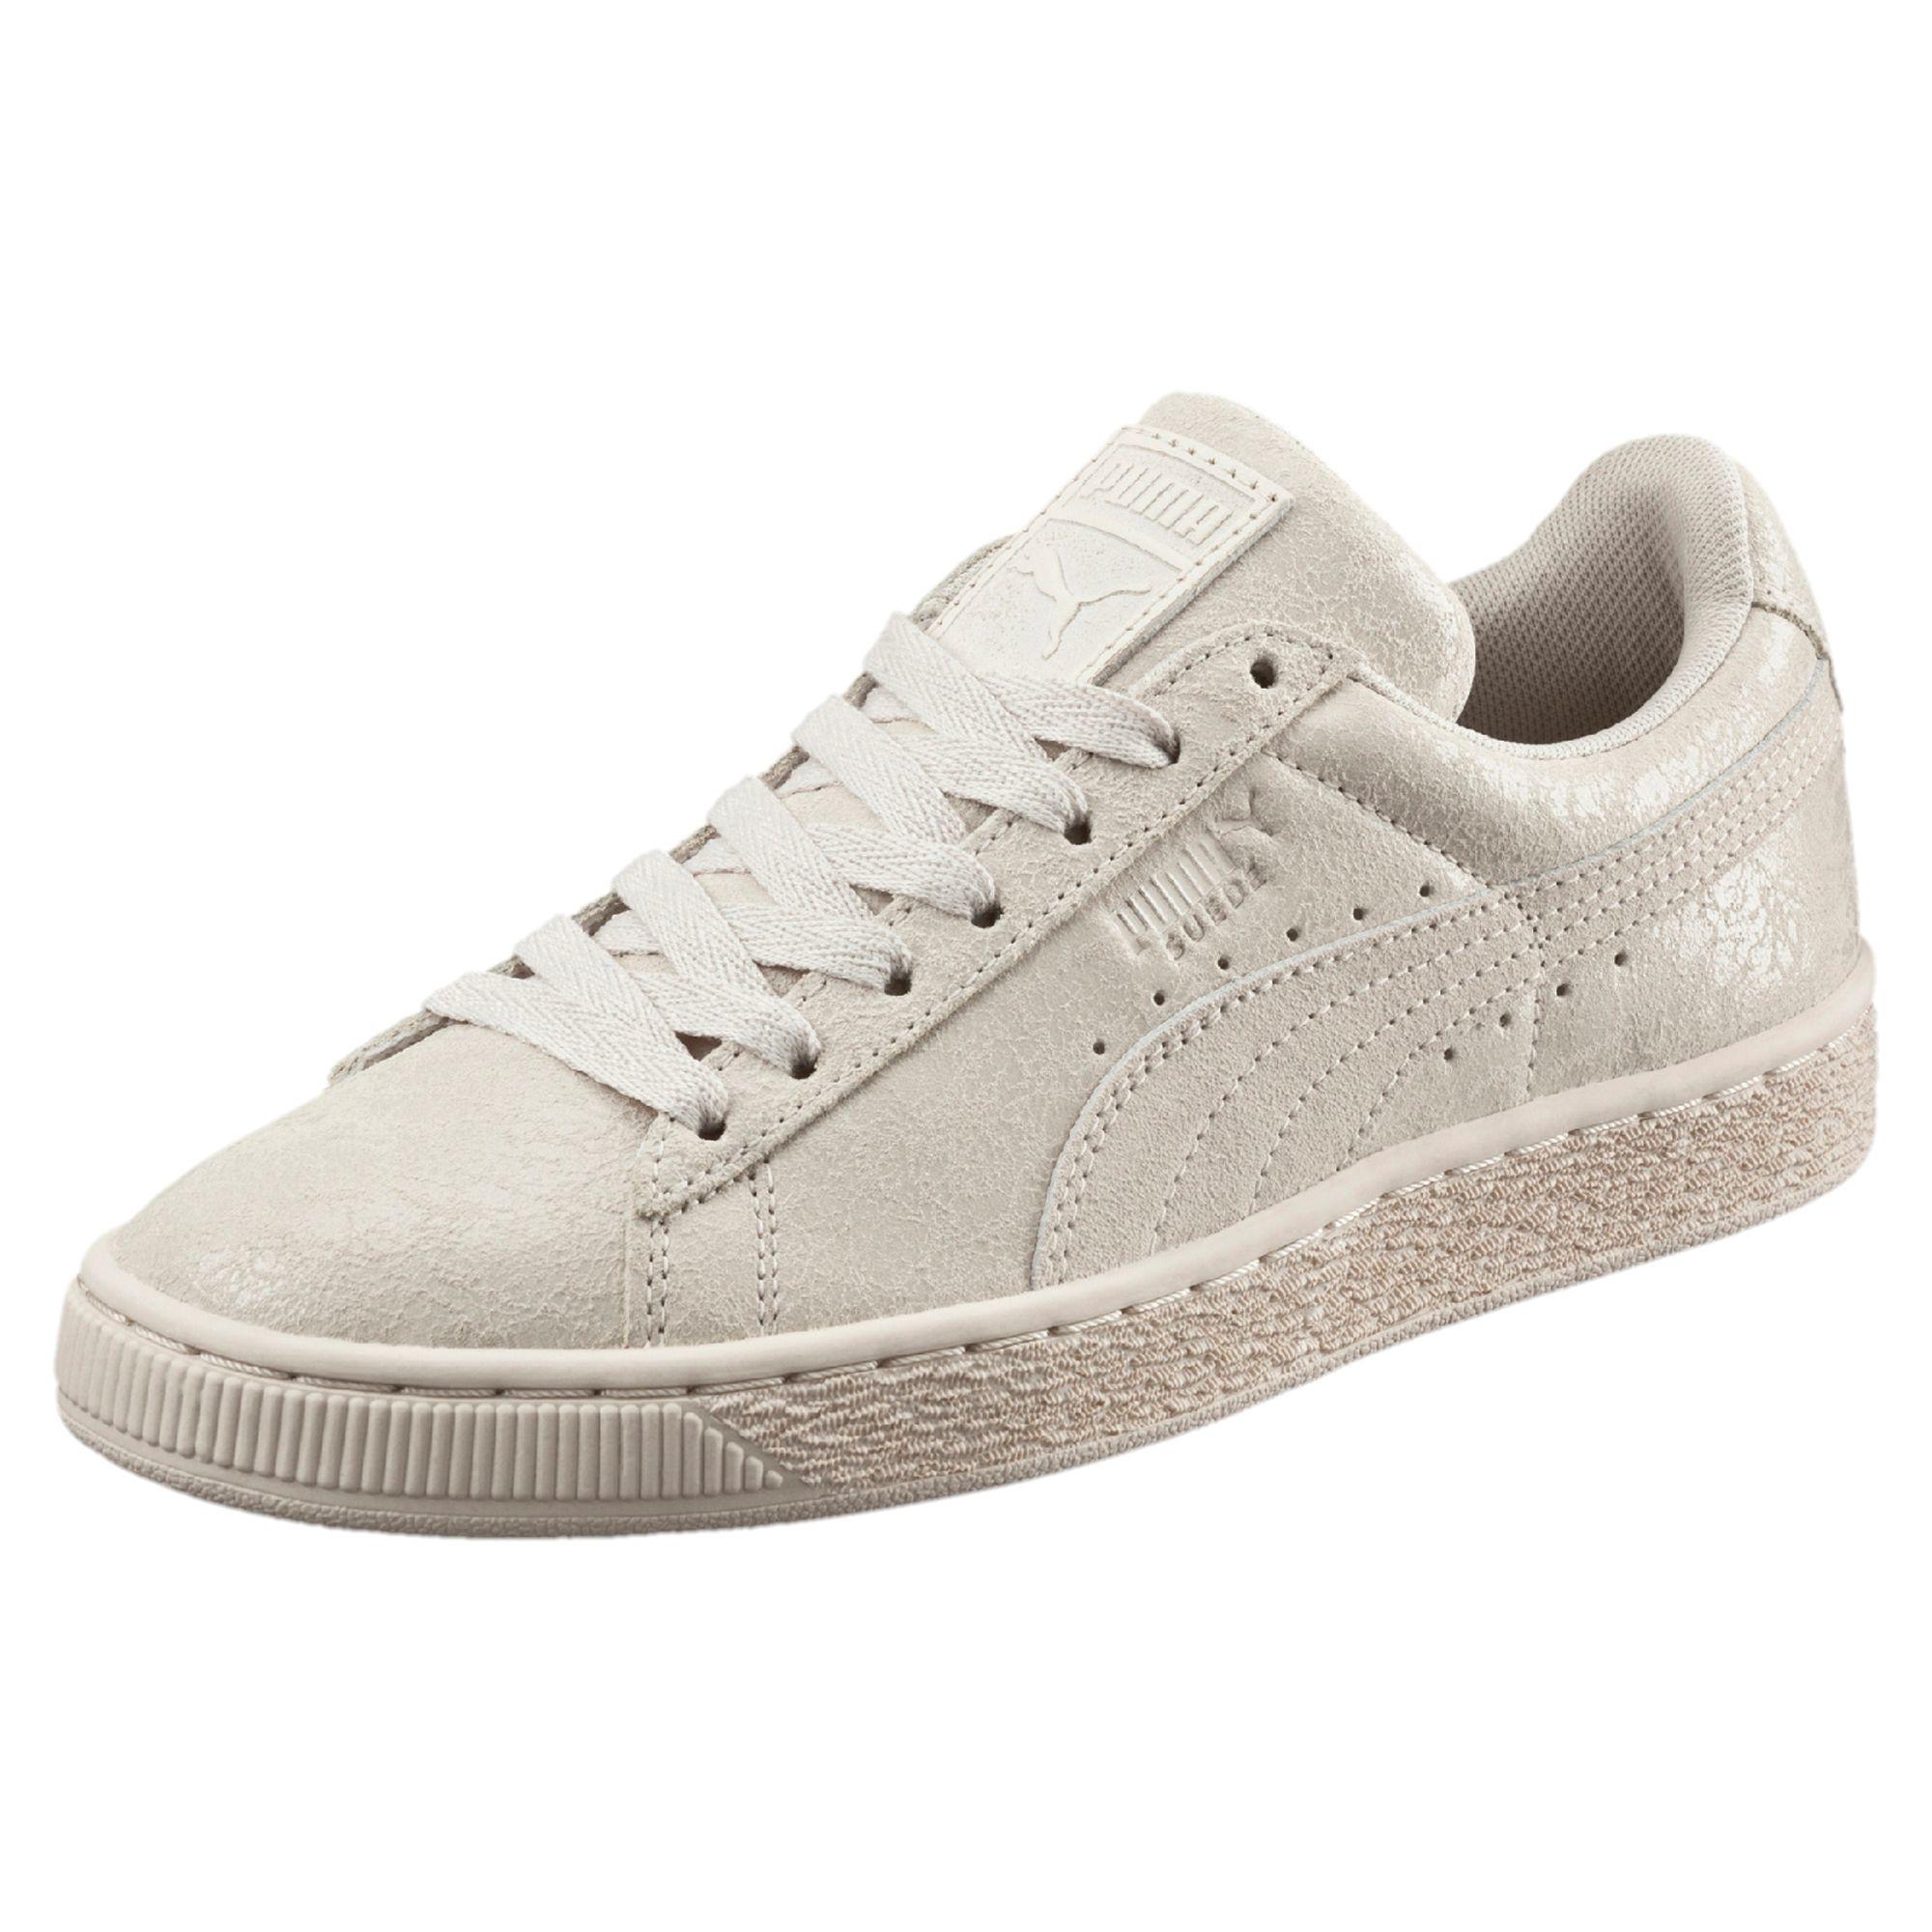 Sneakers Suede Women's Remaster Lyst Puma OqTw7cS0